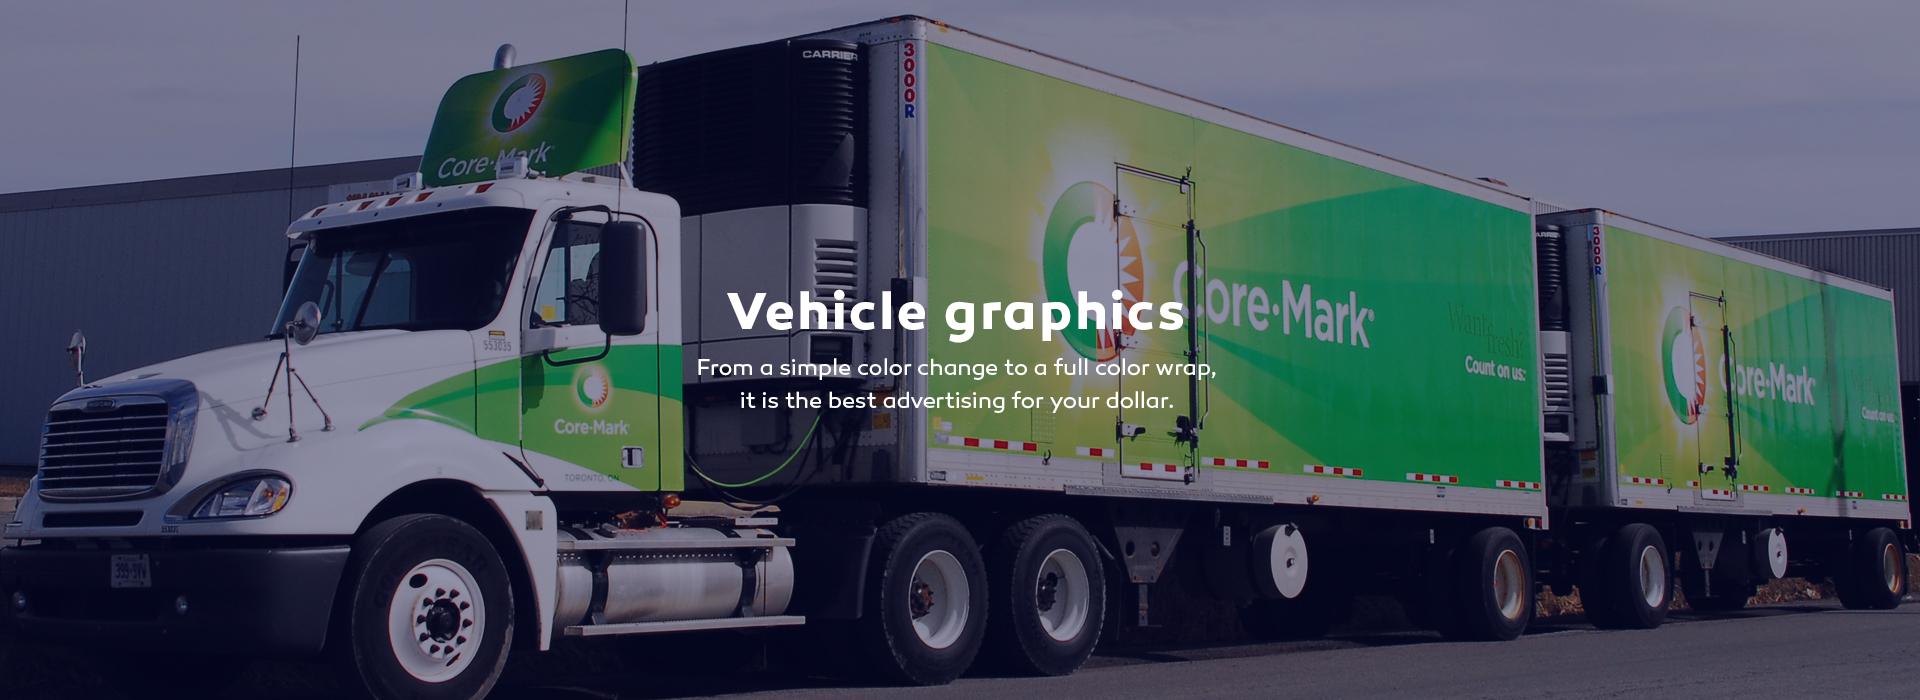 vehicle wraps, vehicle graphics